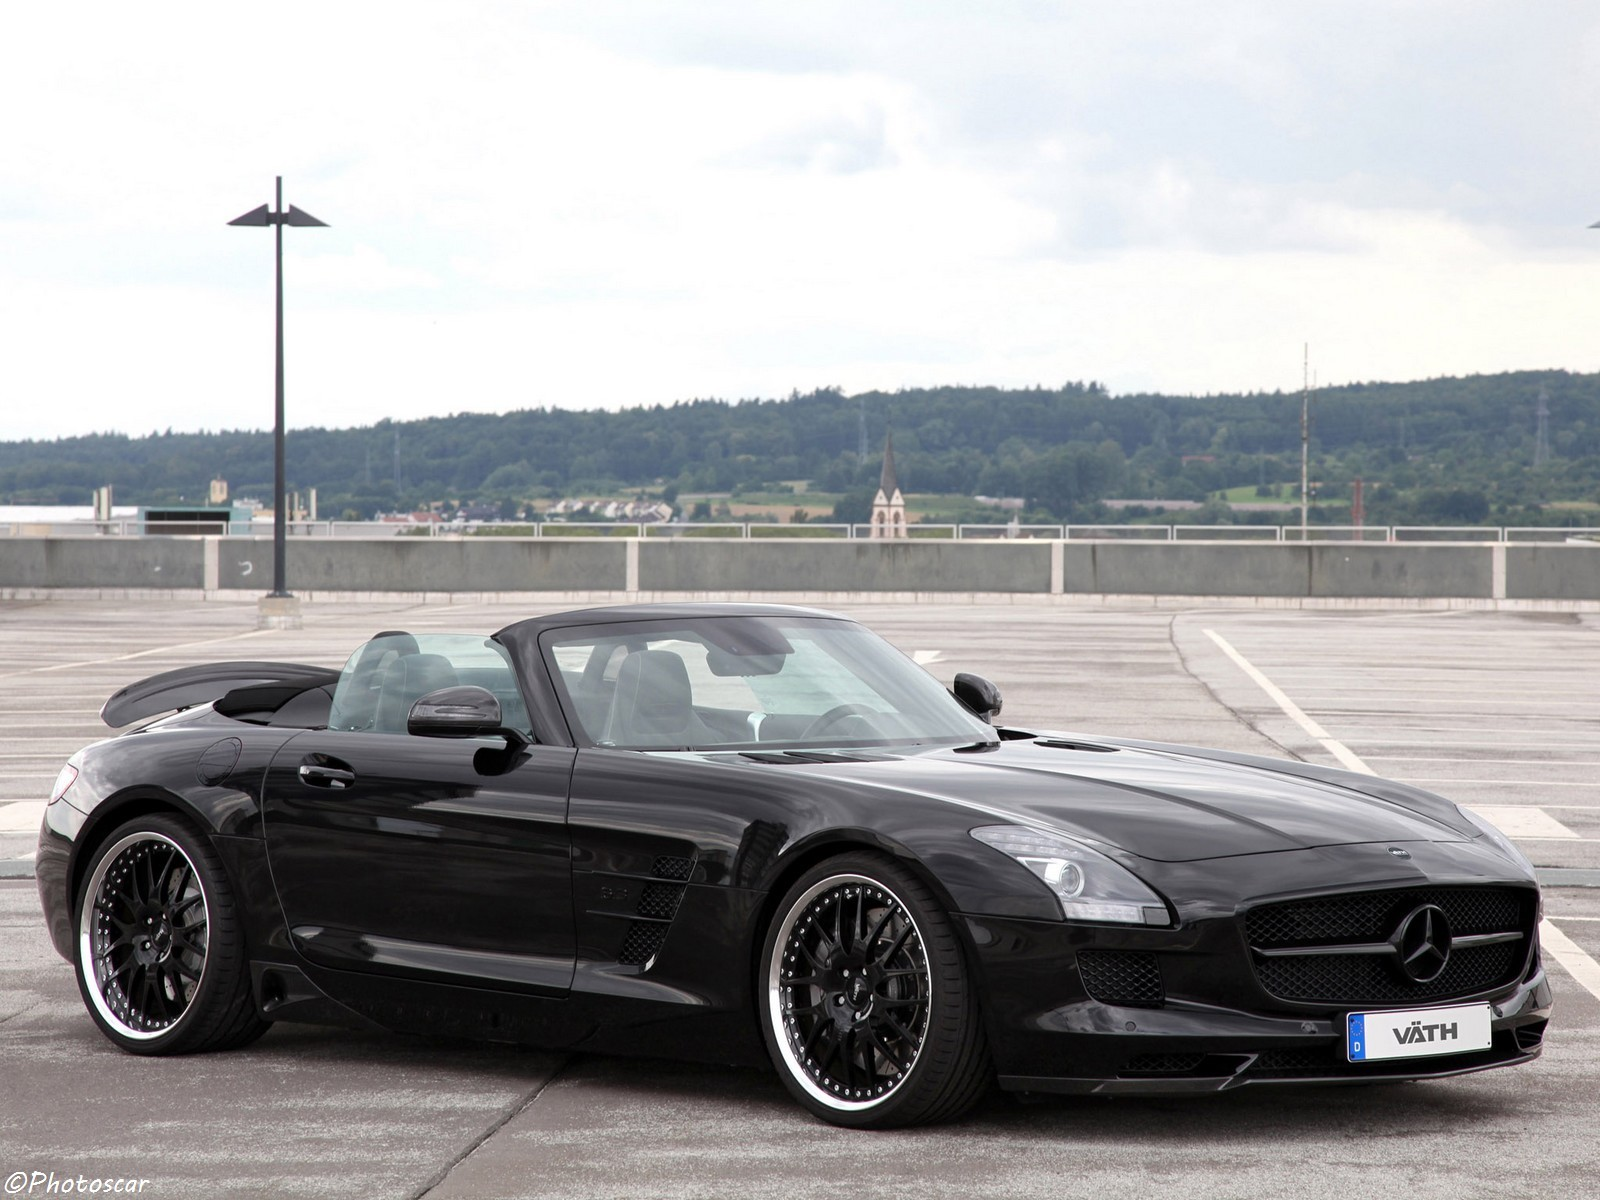 VATH_Mercedes_AMG_SLS Roadster 2012